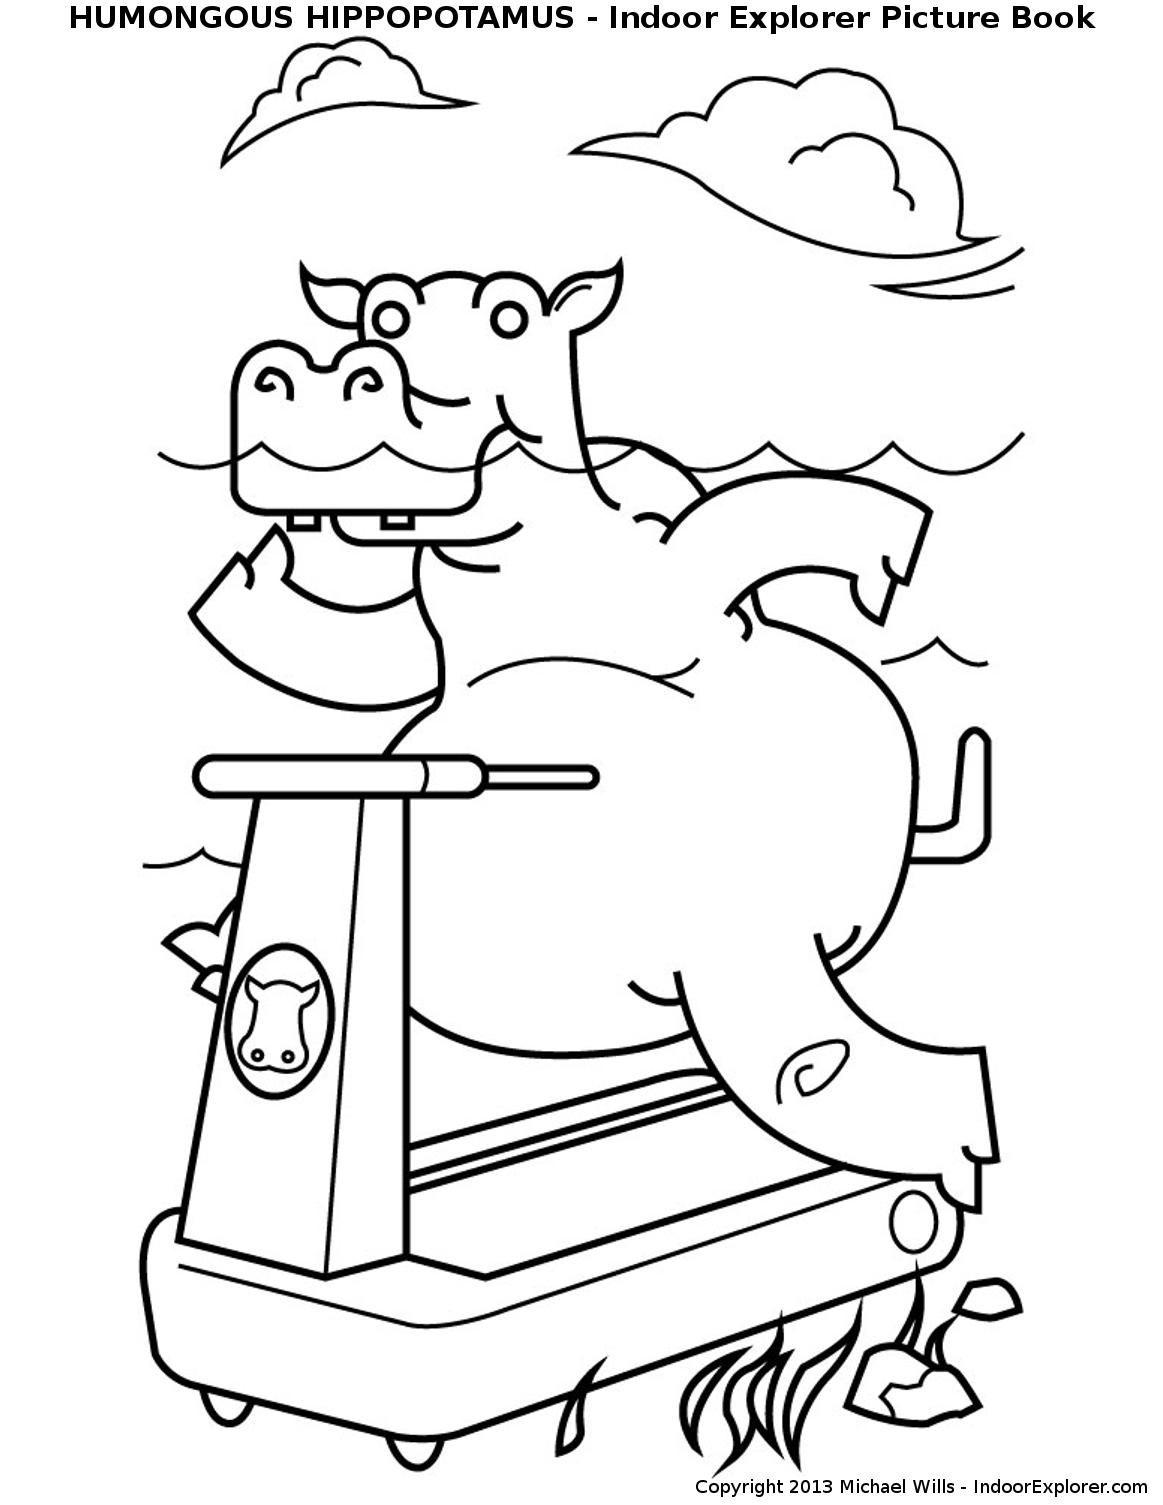 Humongous Hippopotamus In Training printable kids